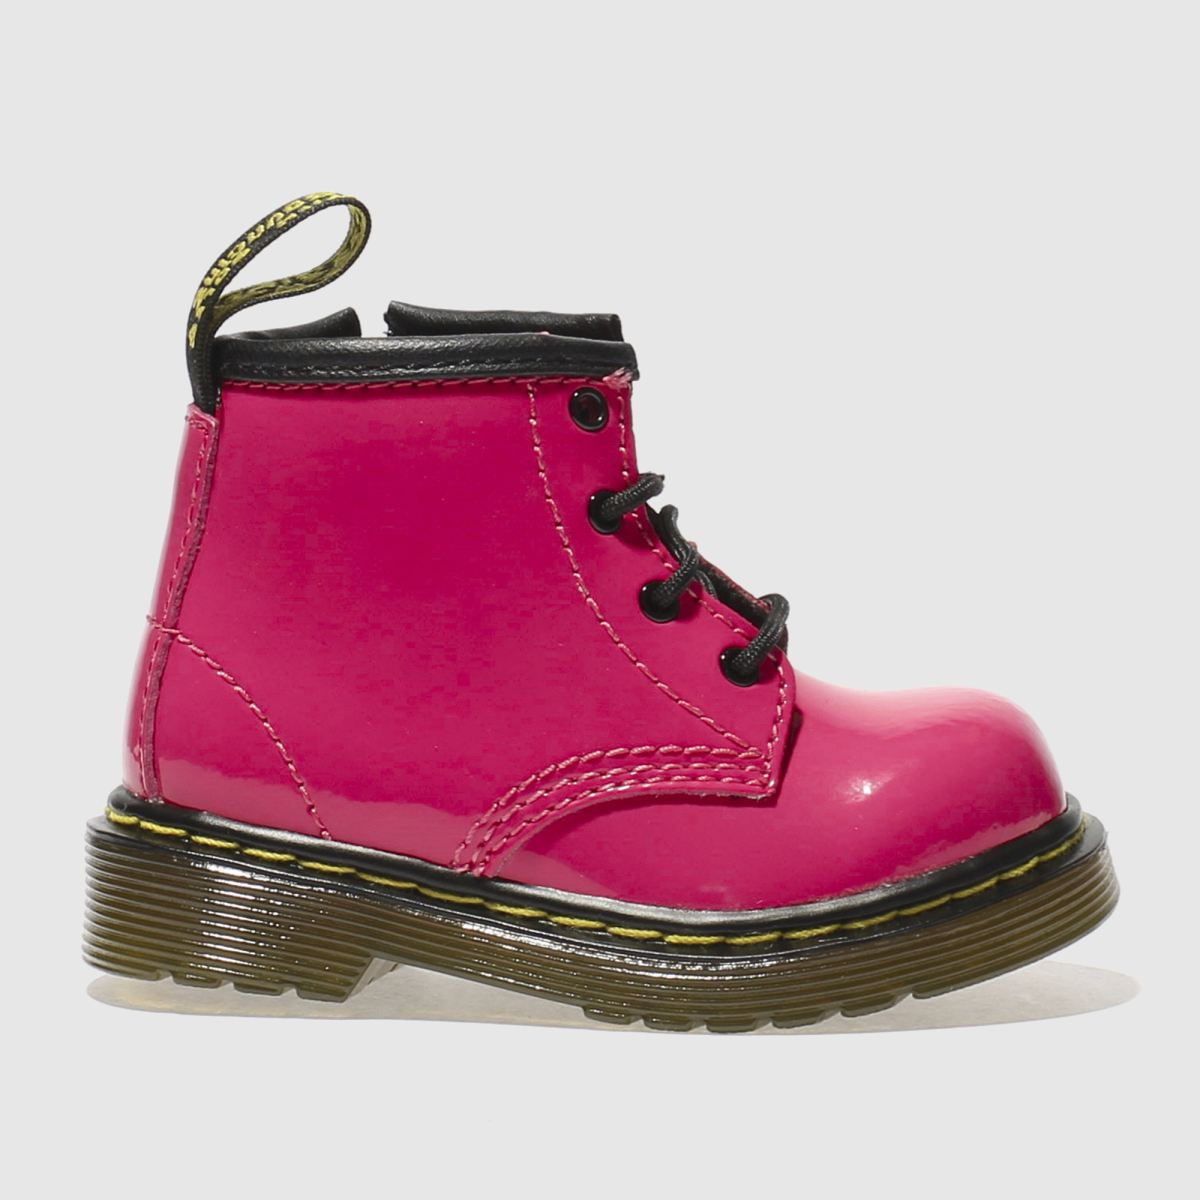 Dr Martens Pink 1460 Girls Toddler Boots